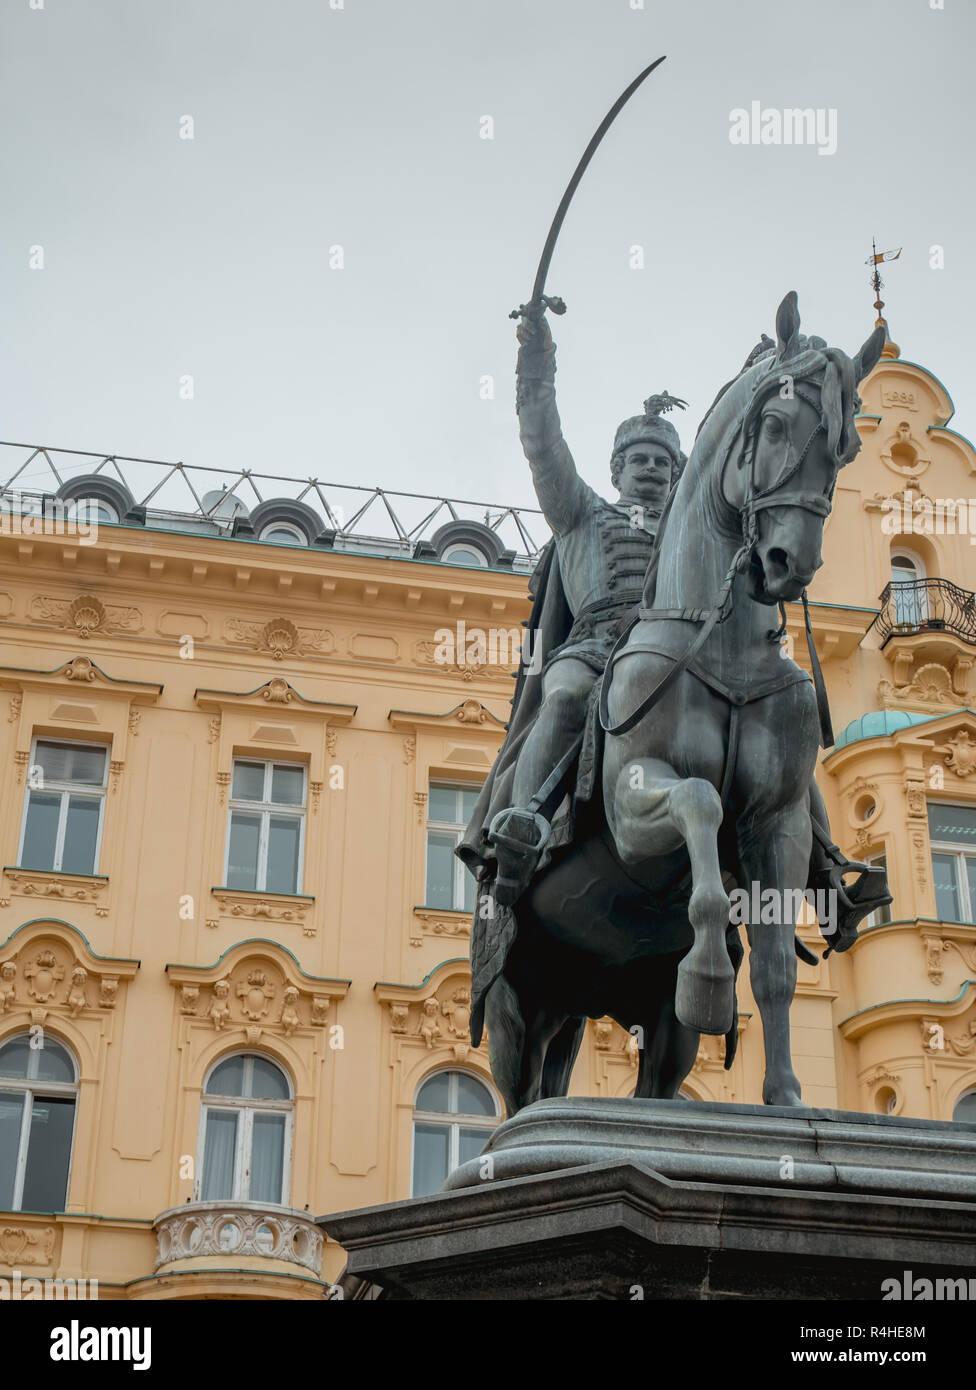 Statue of ban Josip Jelacic on main square in Zagreb, Croatia Stock Photo